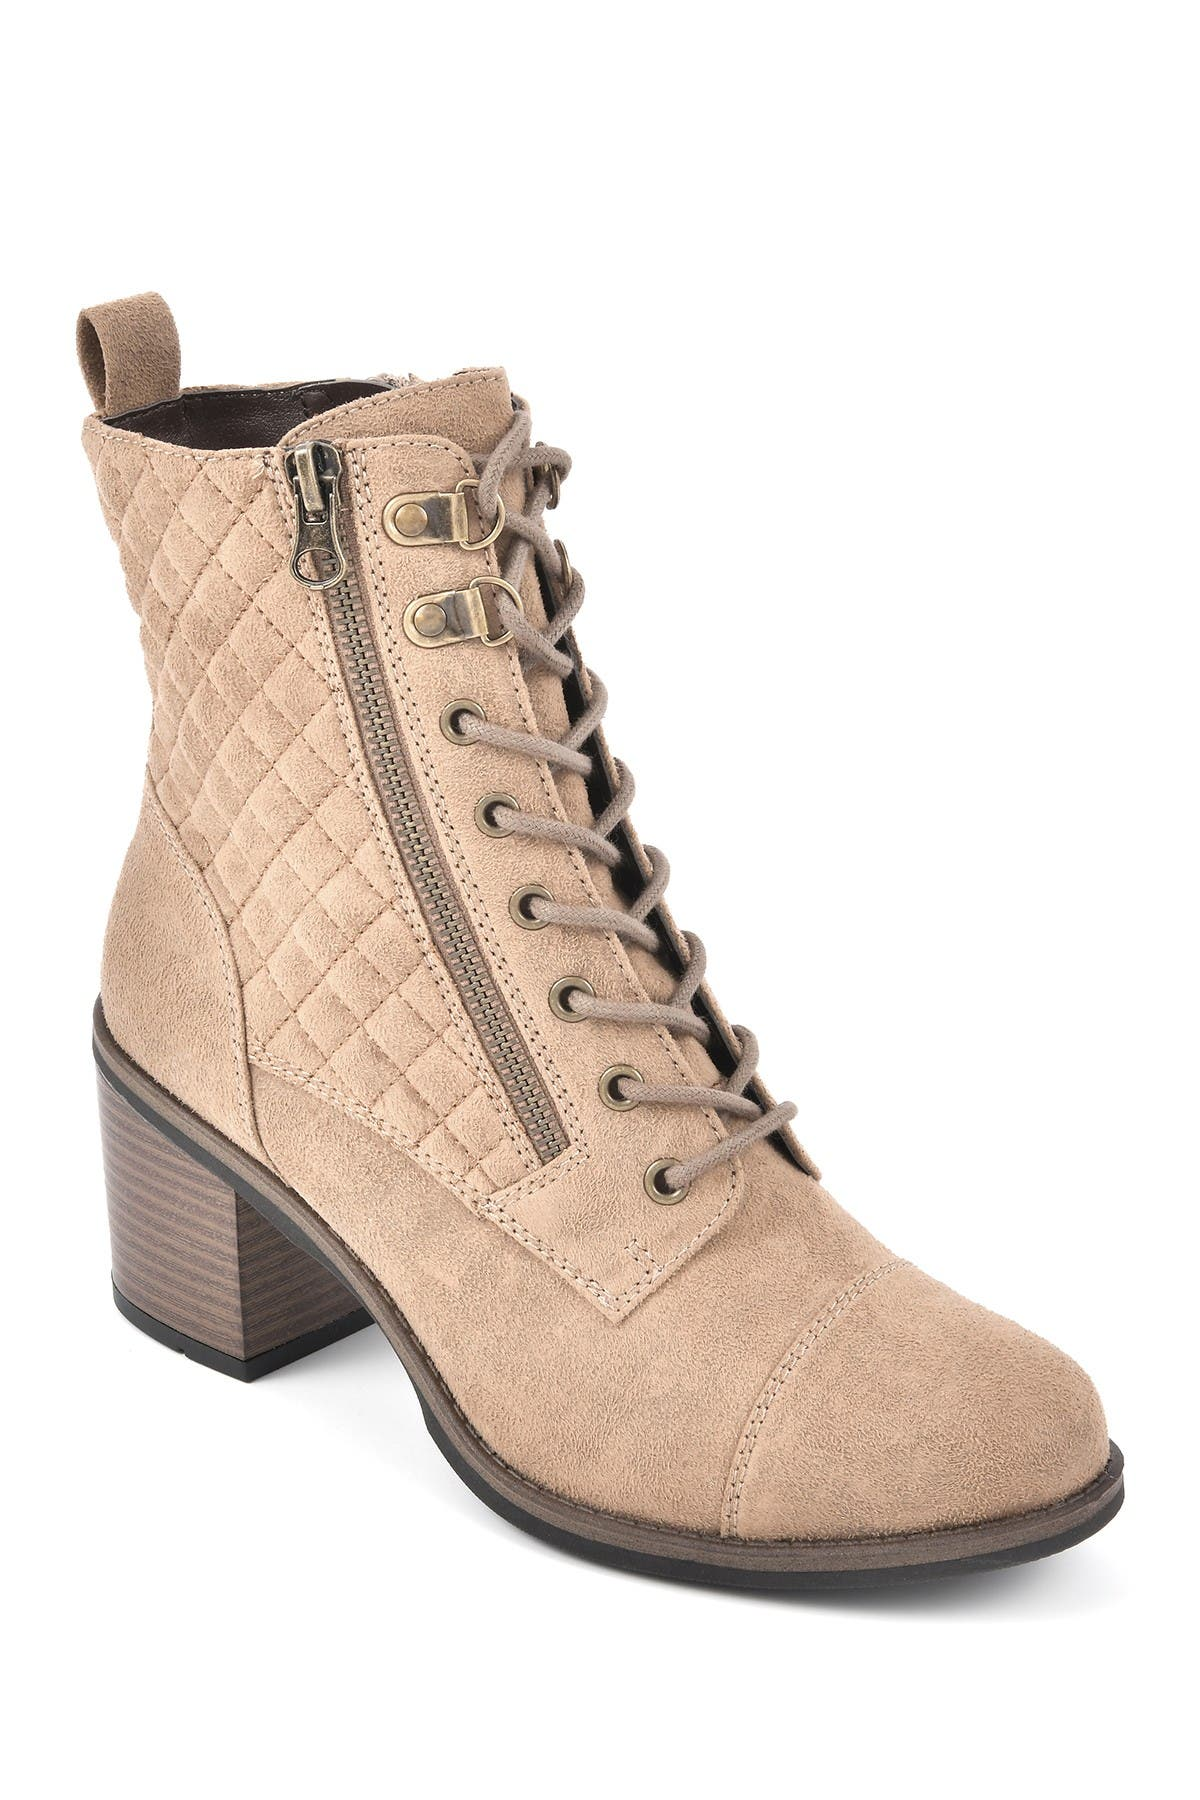 Image of White Mountain Footwear Dorsett Block Heel Bootie